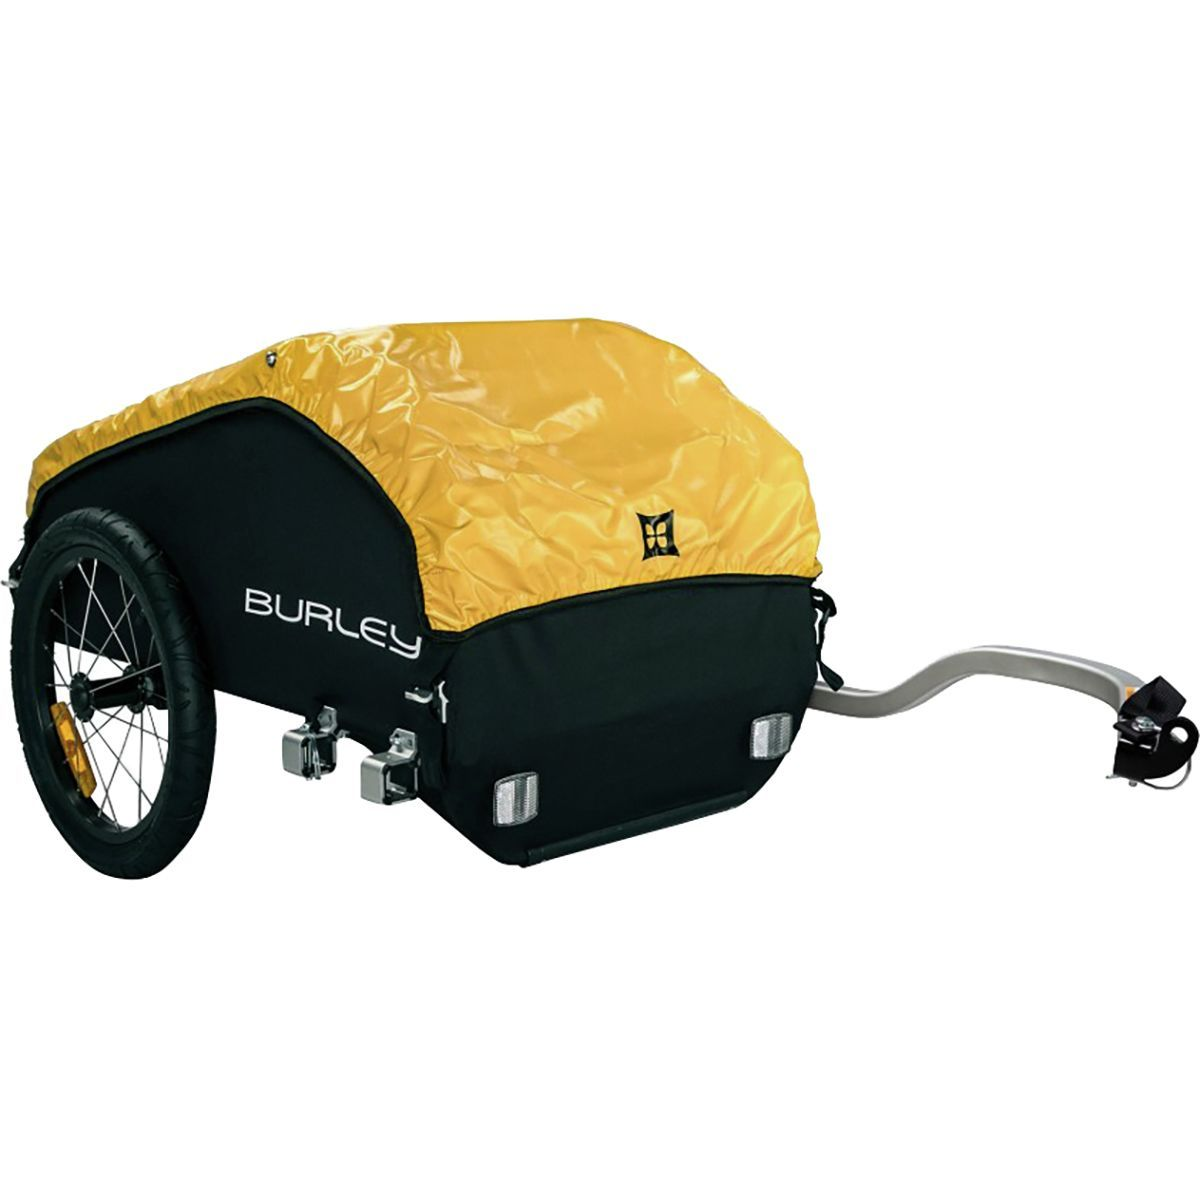 Burley Nomad Trailer Bike cargo trailer, Cargo trailers